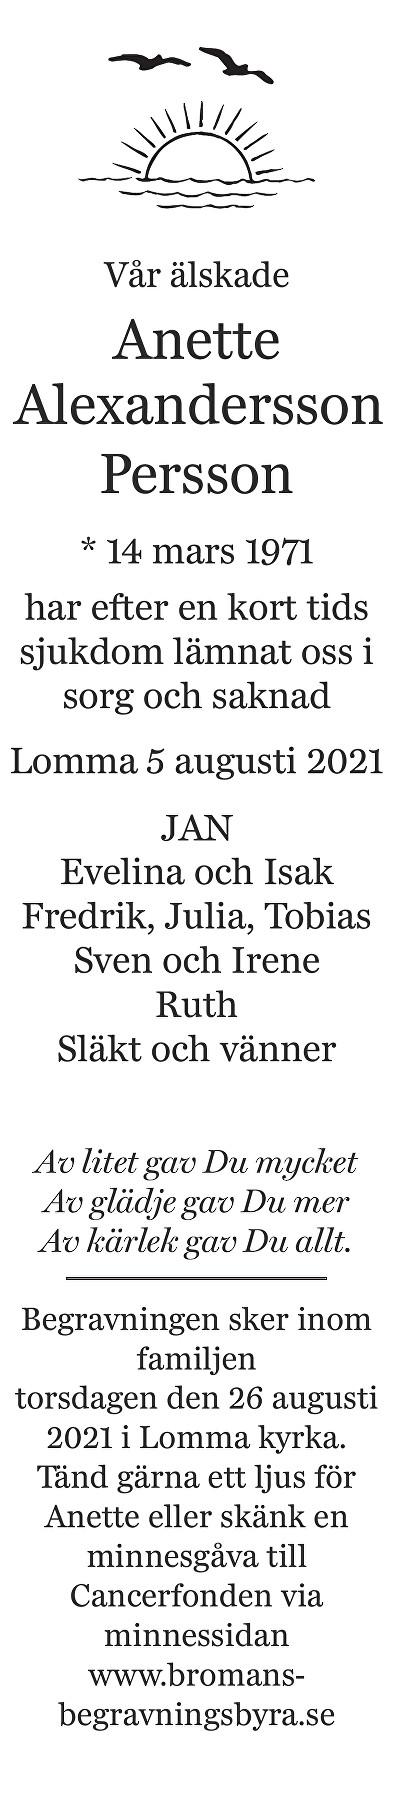 Anette Alexandersson Persson Death notice